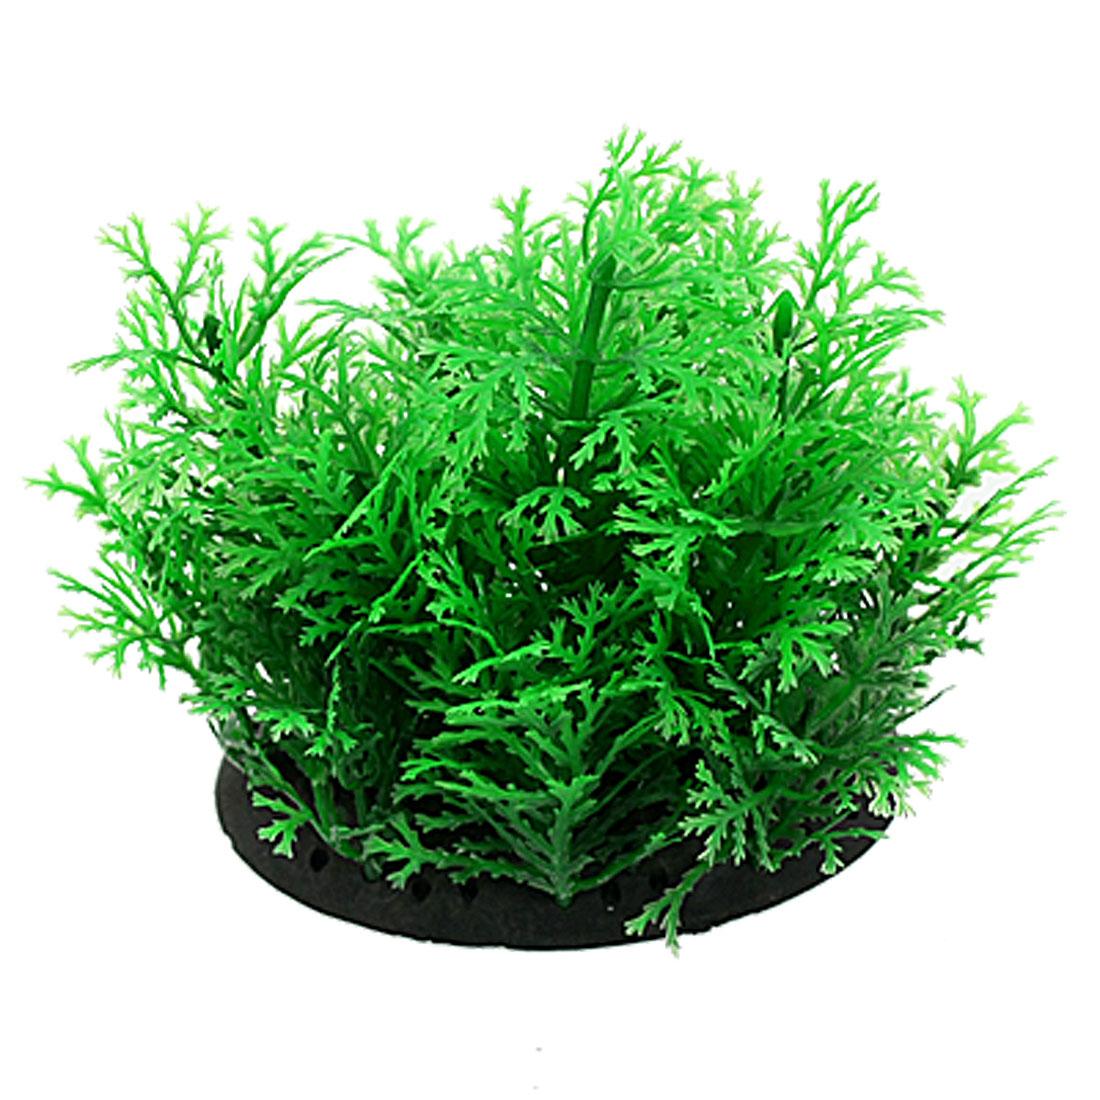 "Aquarium Oval Base Snowflake Leaf 3.1"" High Green Plastic Plant Decor"